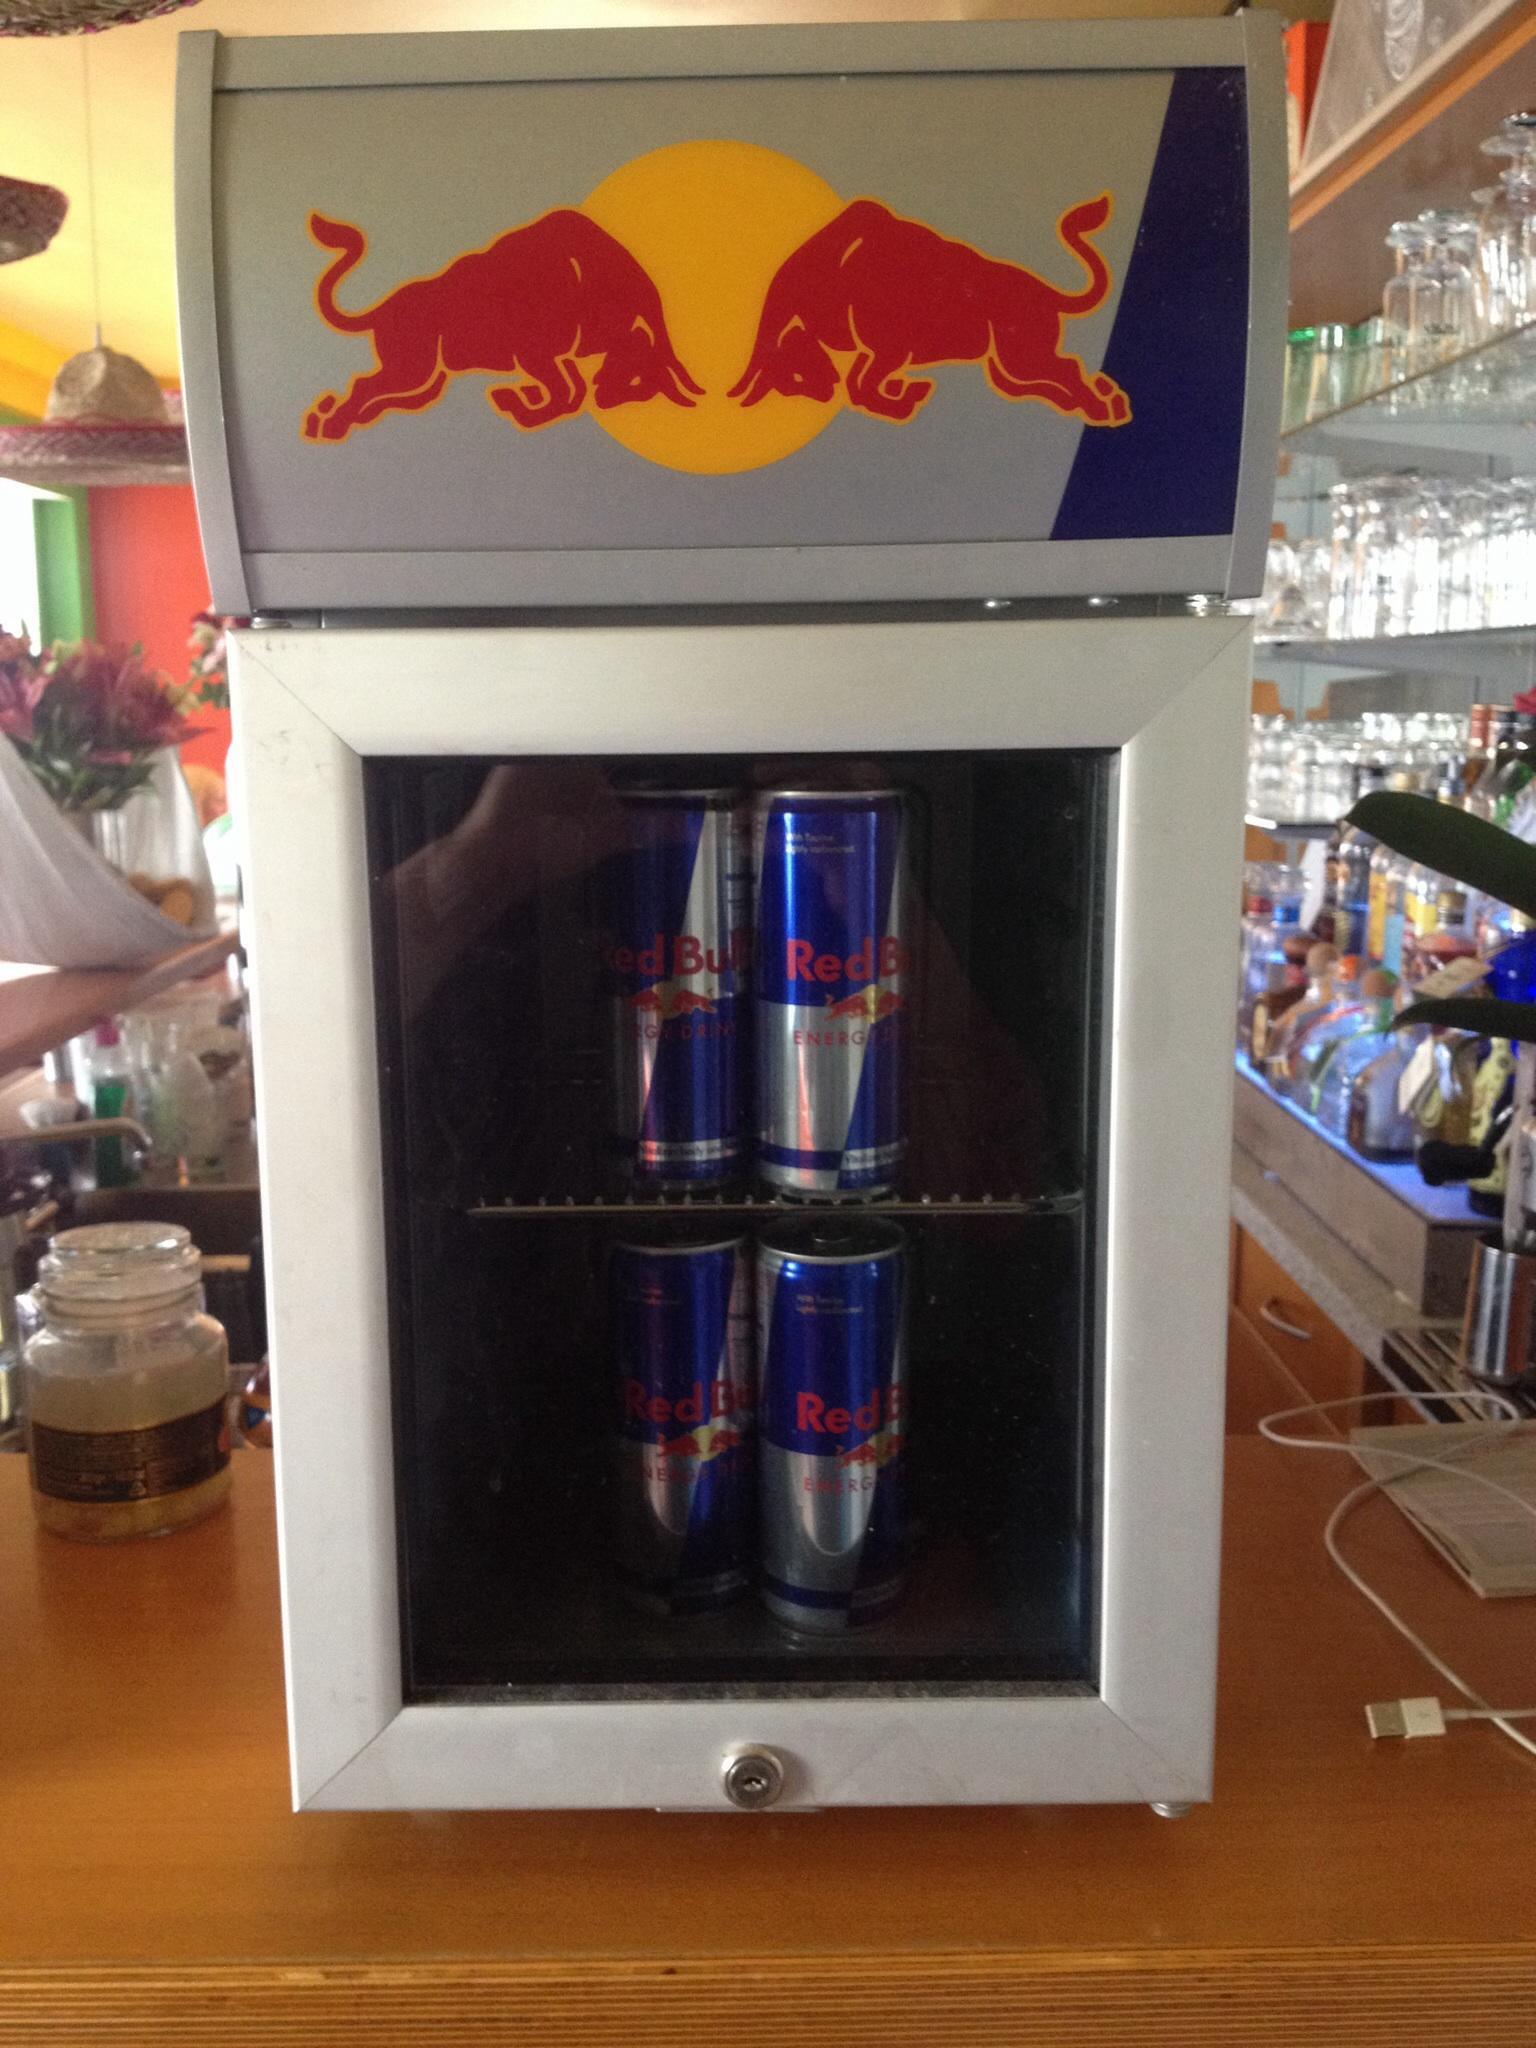 Red Bull Kühlschrank Bestellen : Red bull kühlschrank bestellen red bull energy drink er pack ml